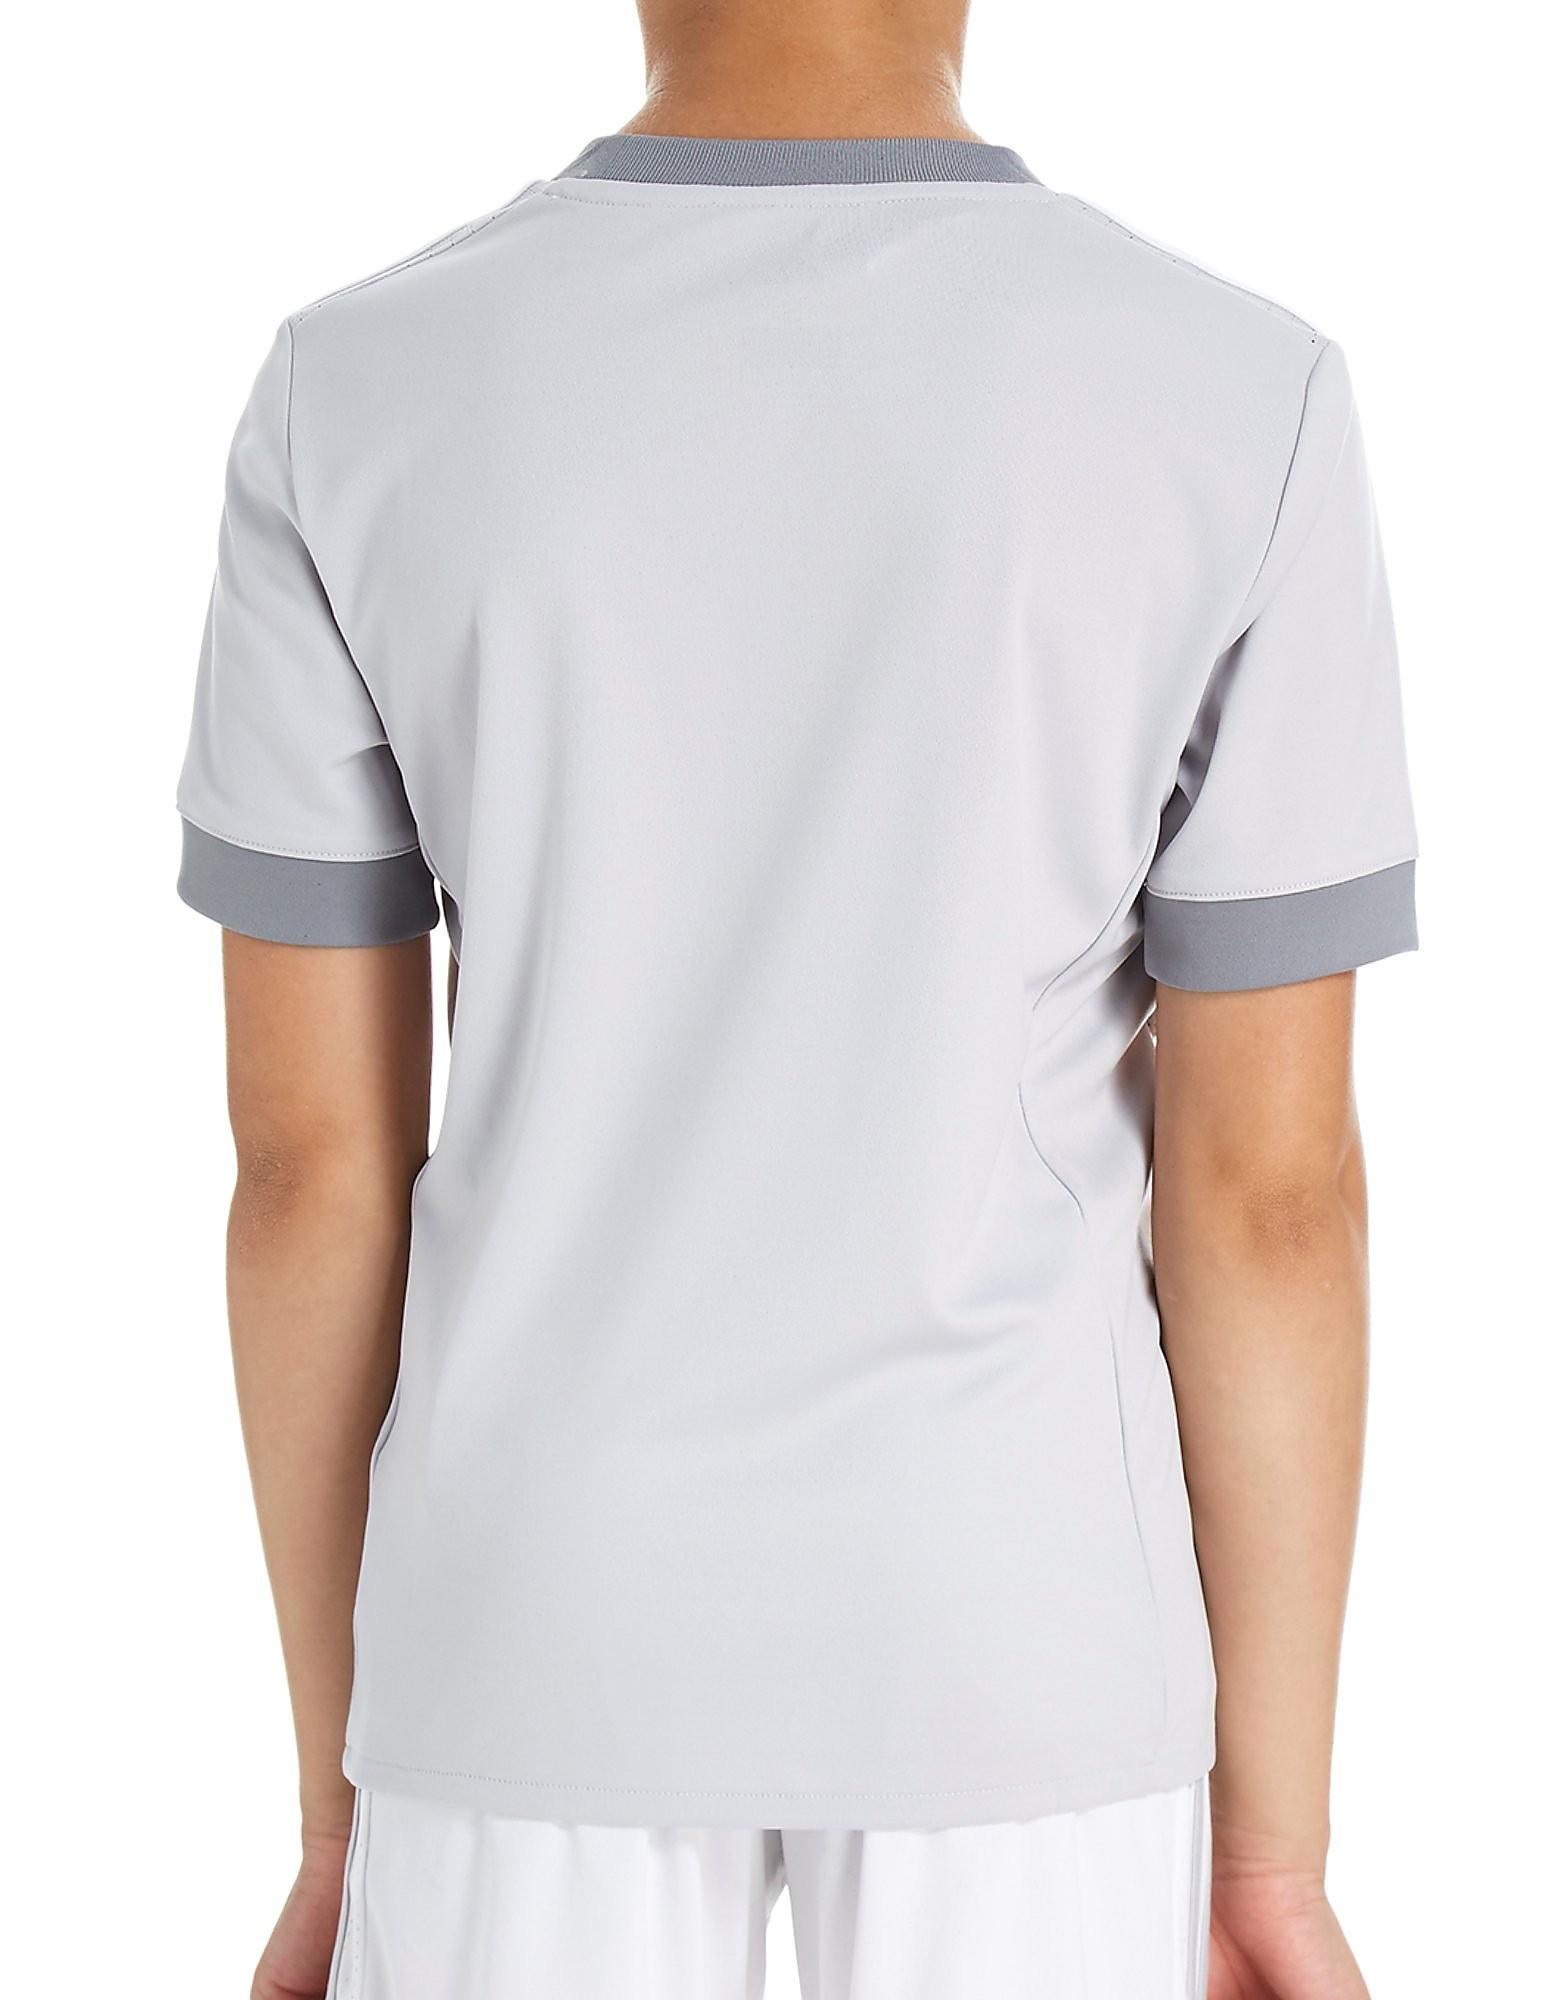 adidas Manchester United 2017/18 Third Shirt Junior